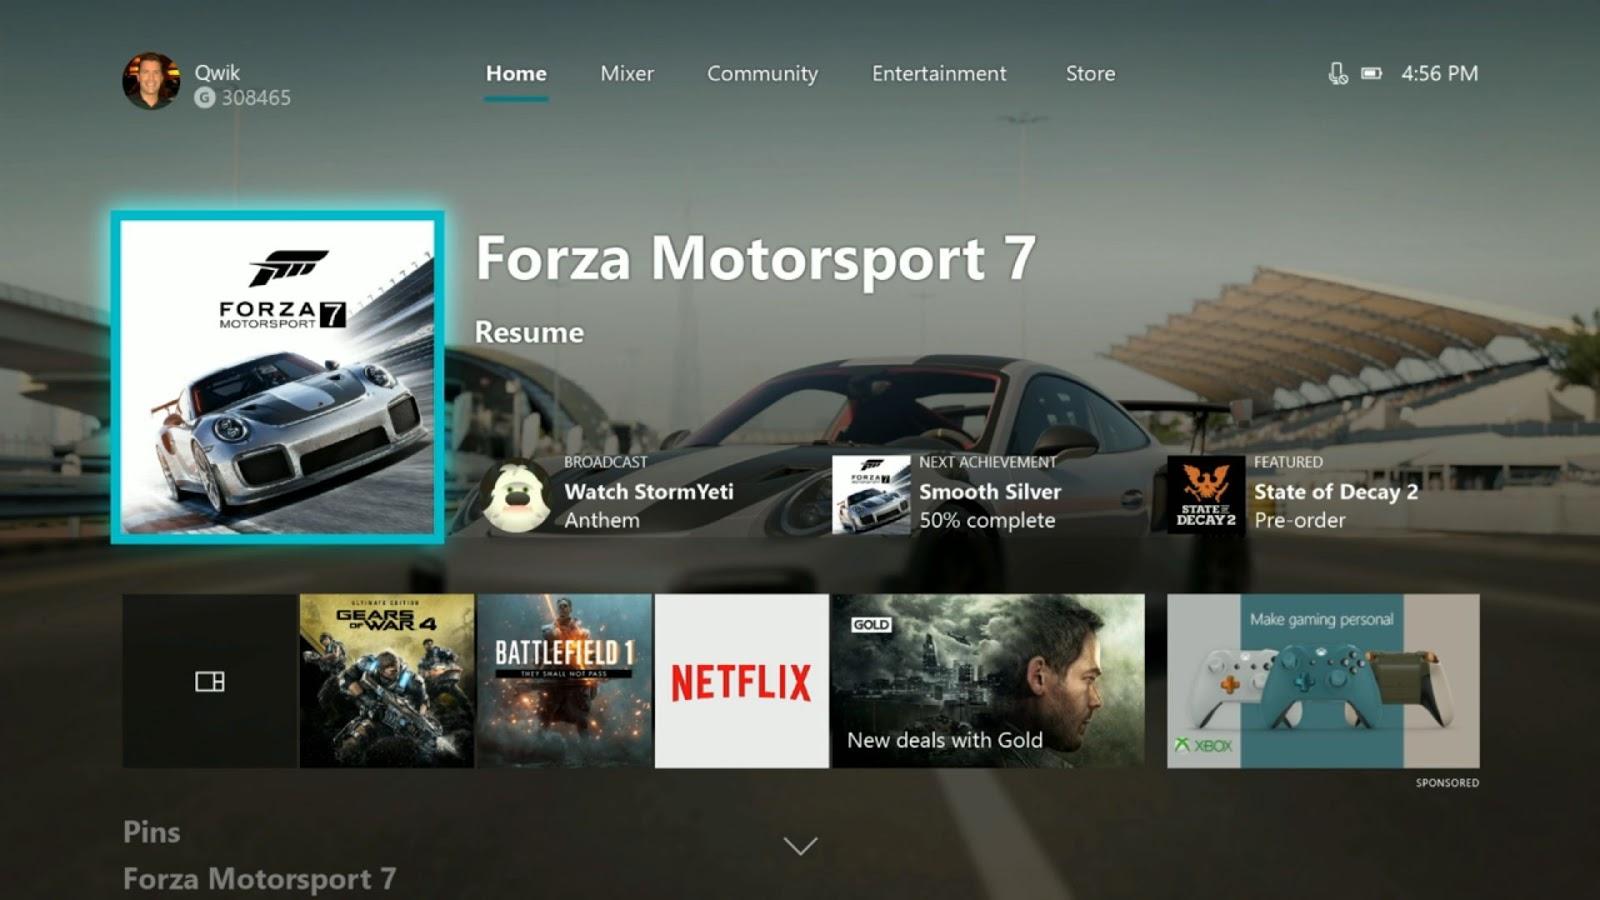 XboxOneUI-3.jpg